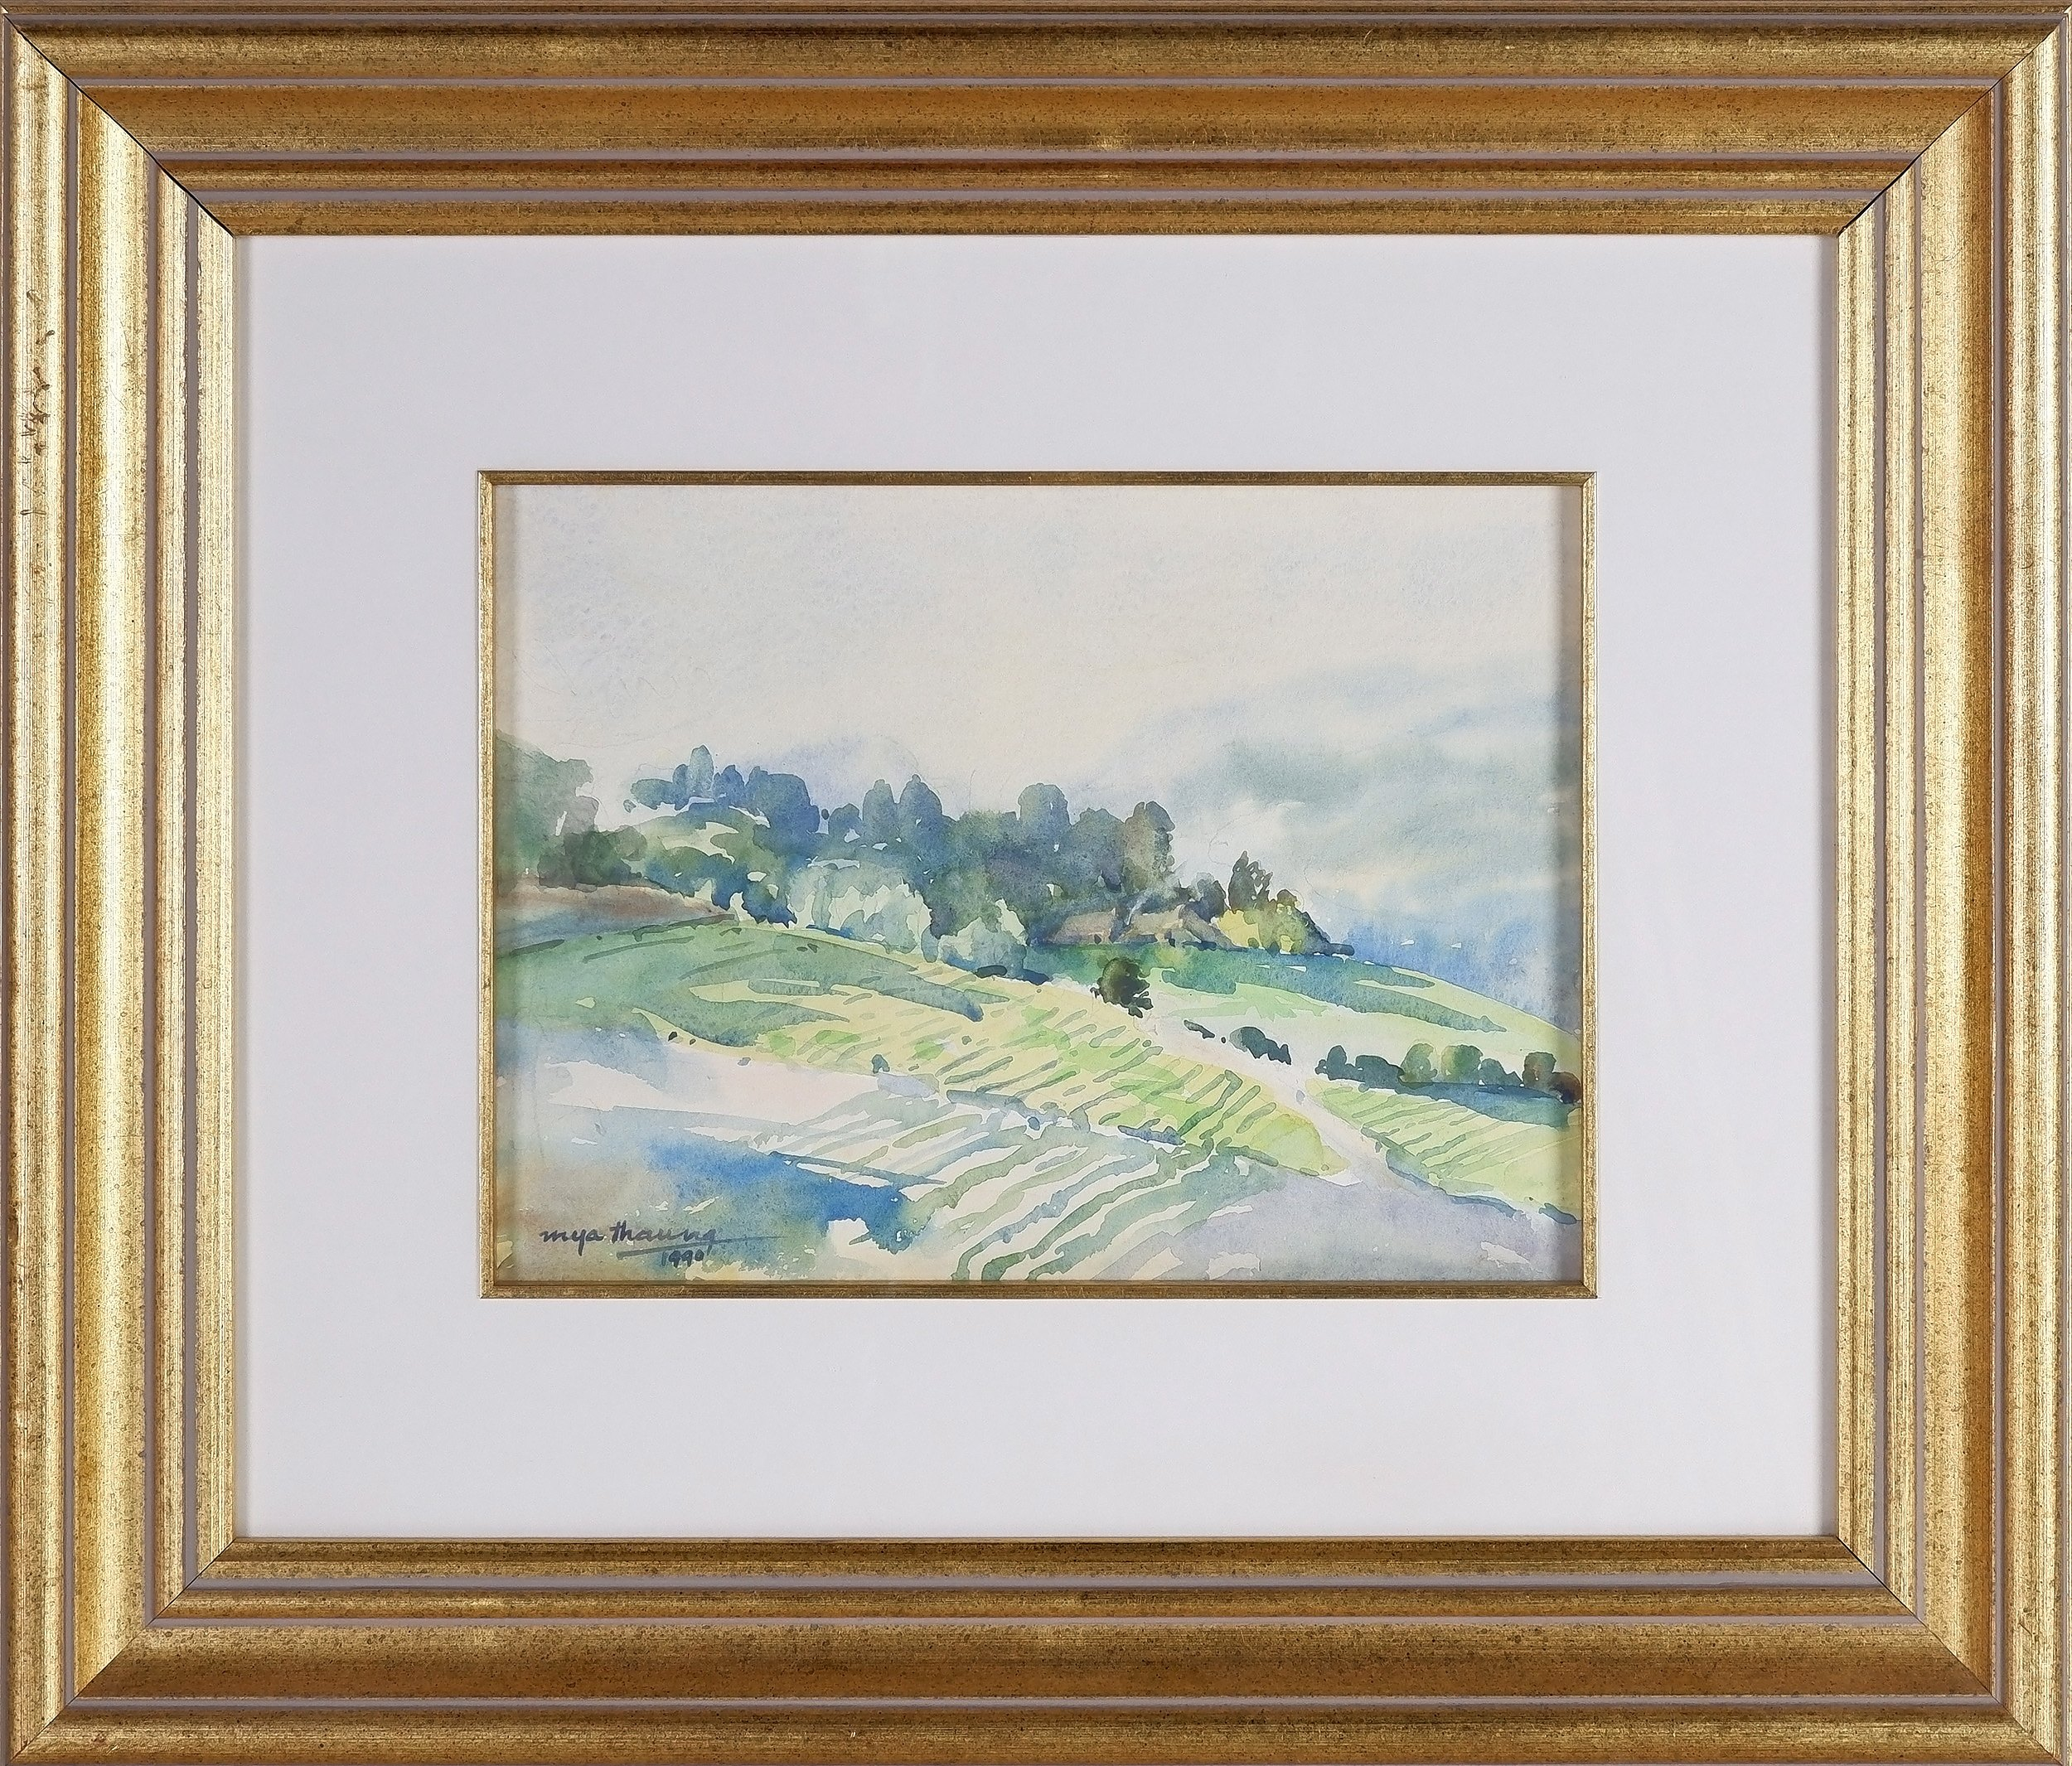 'Mya Thaung  (Burmese 1943-) Winter Hills 1990, Watercolour'